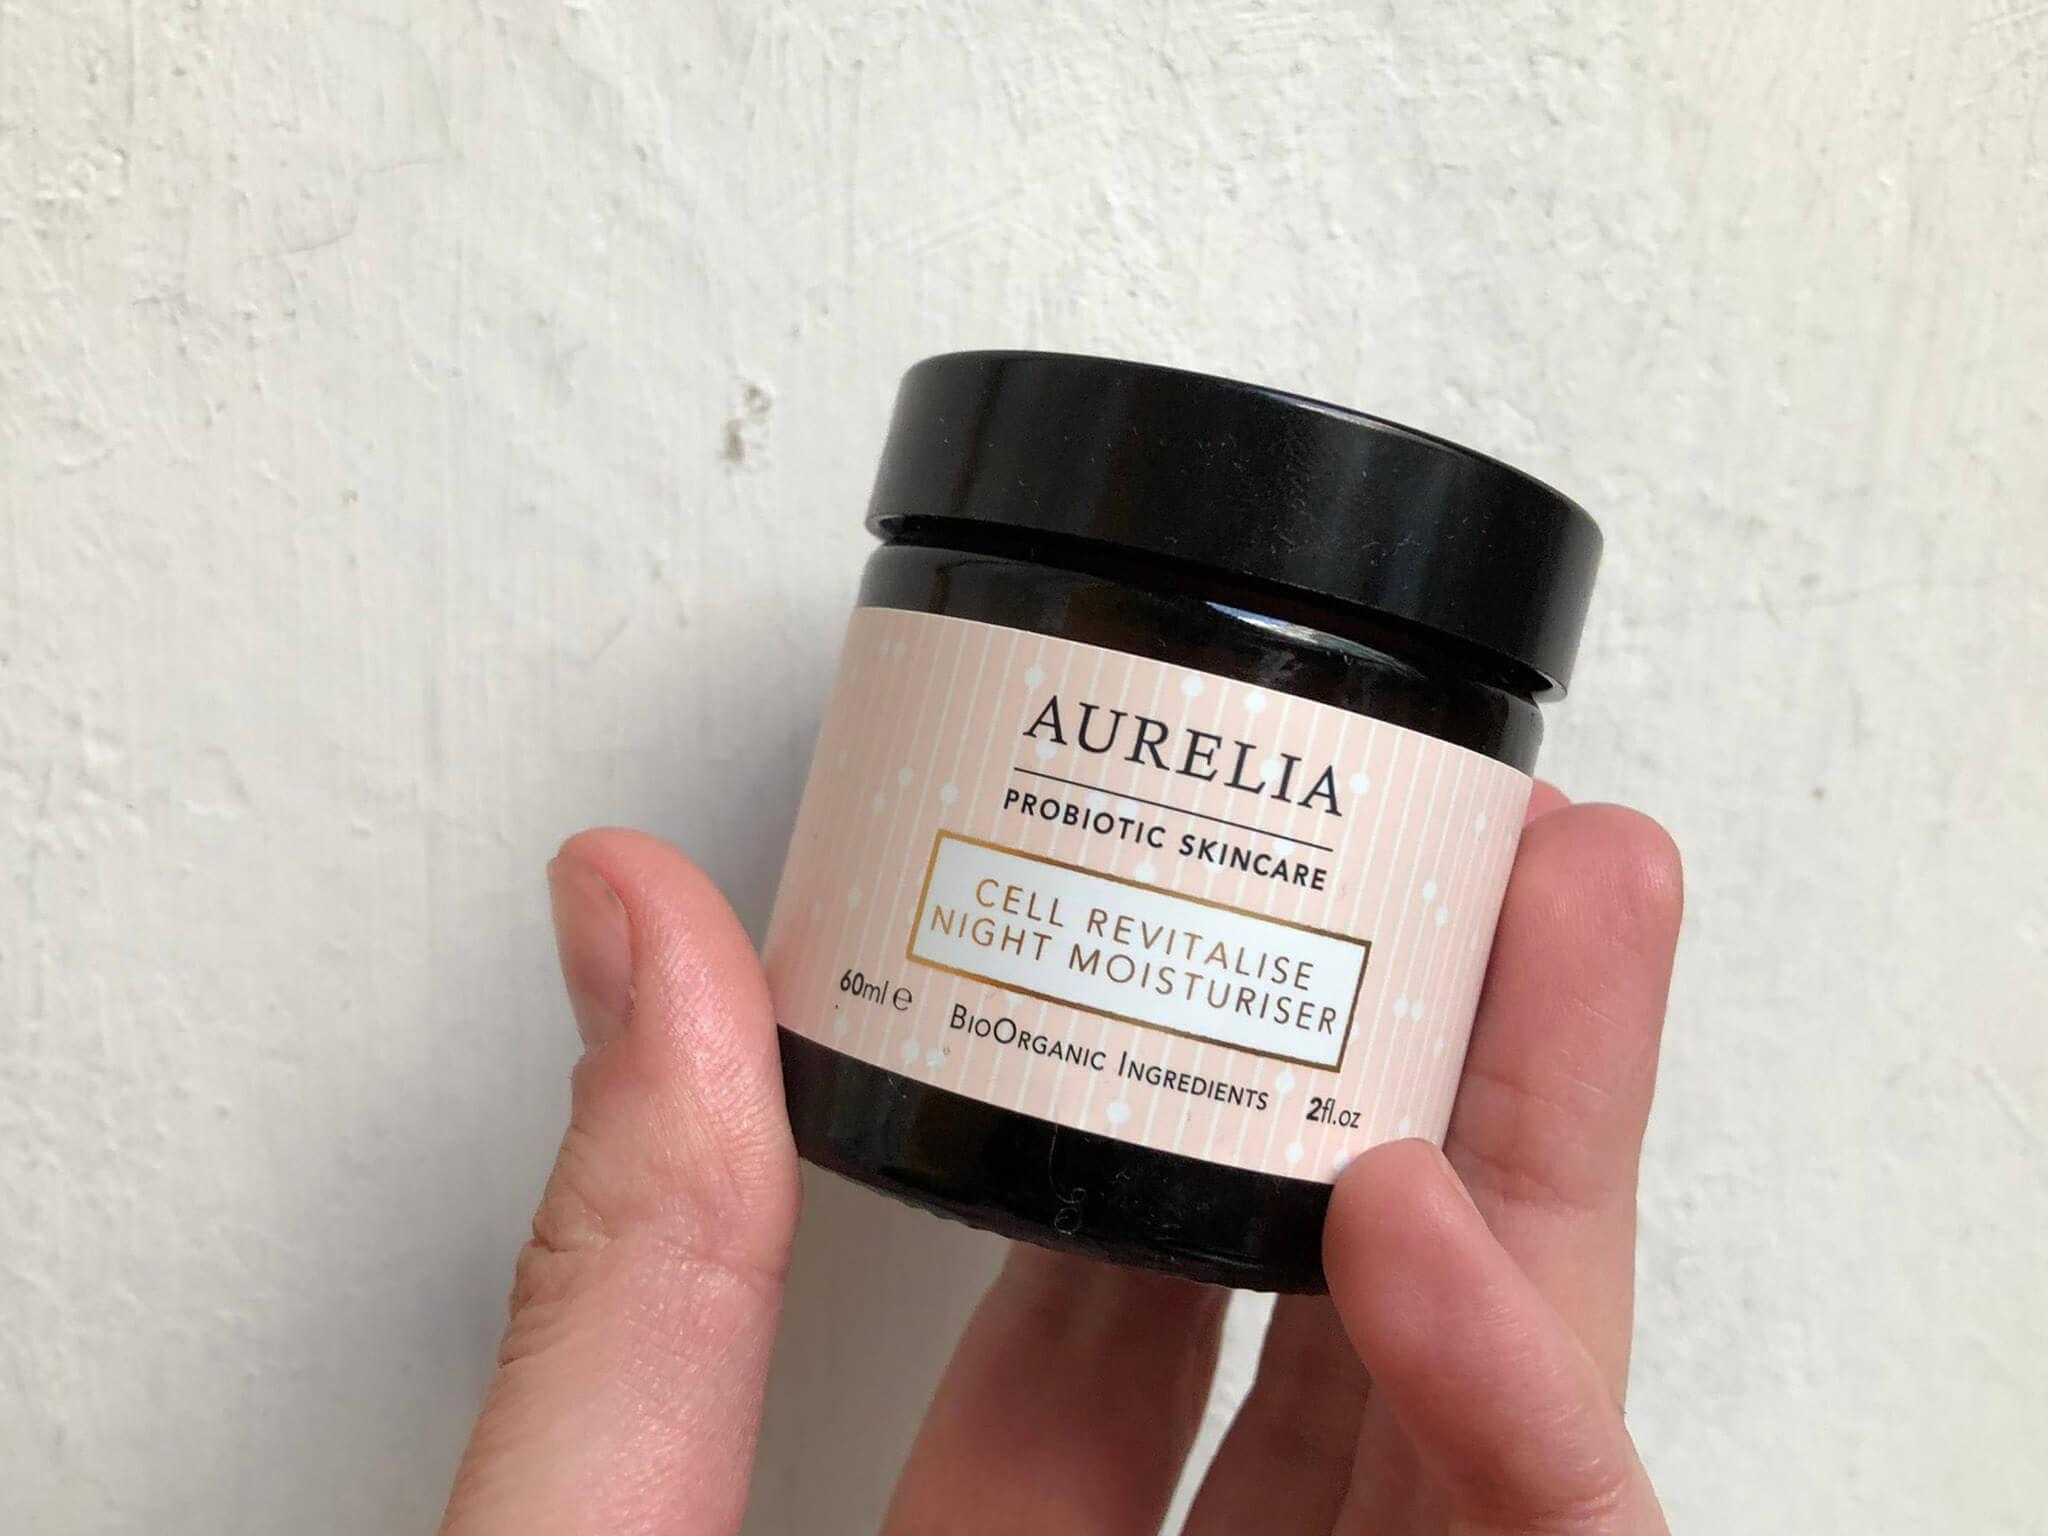 Aurelia Skincare Cell Revitalise Night Moisturiser